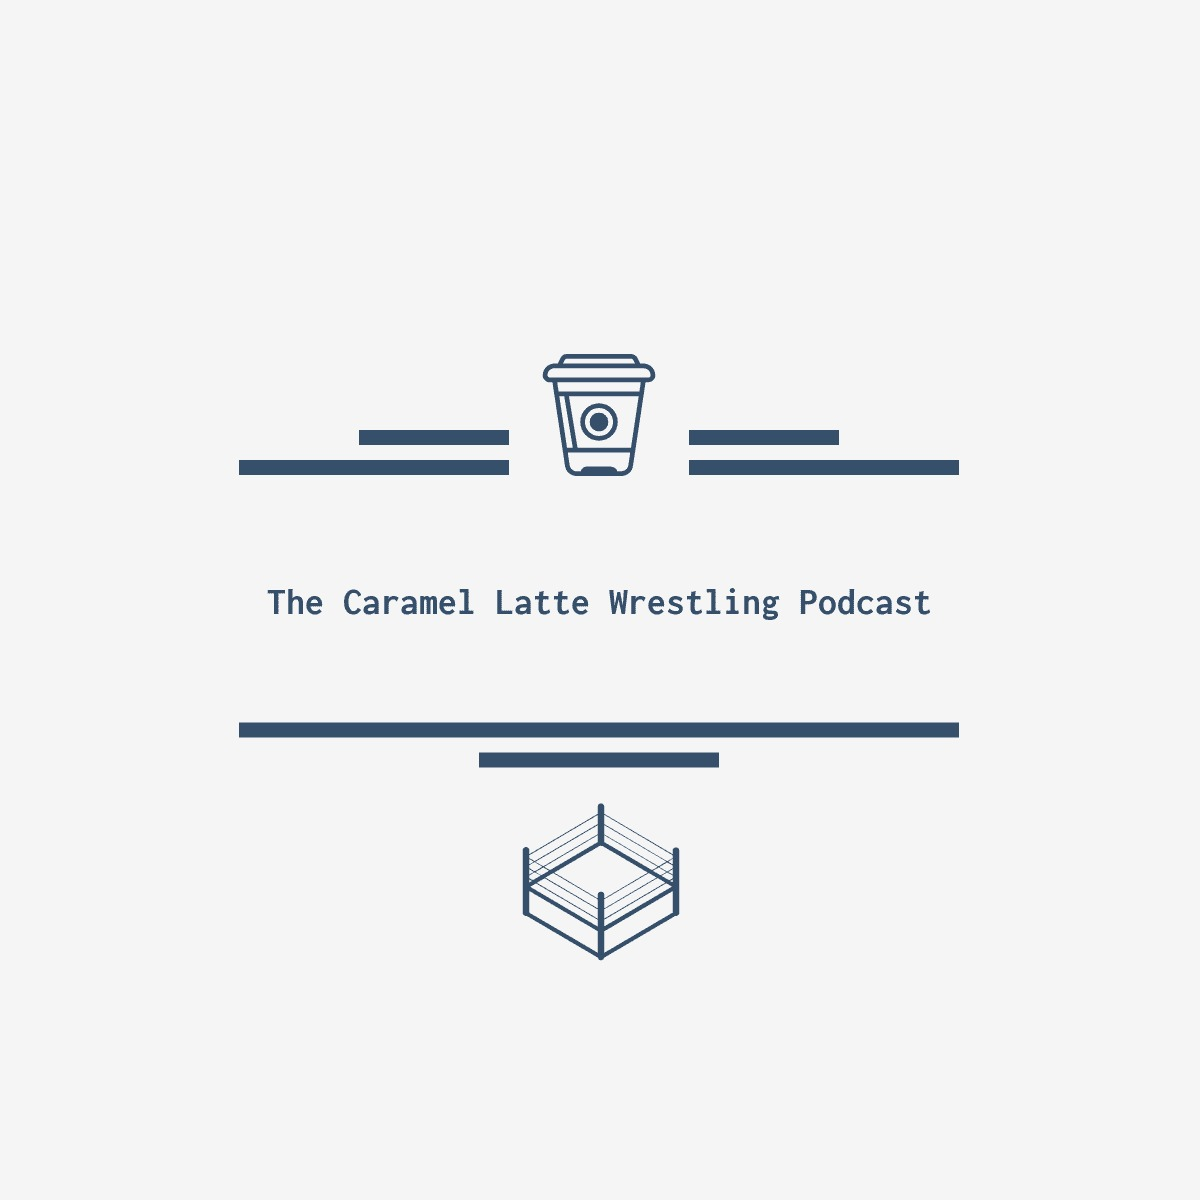 The Caramel Latte Wrestling Podcast   Listen Free on Castbox